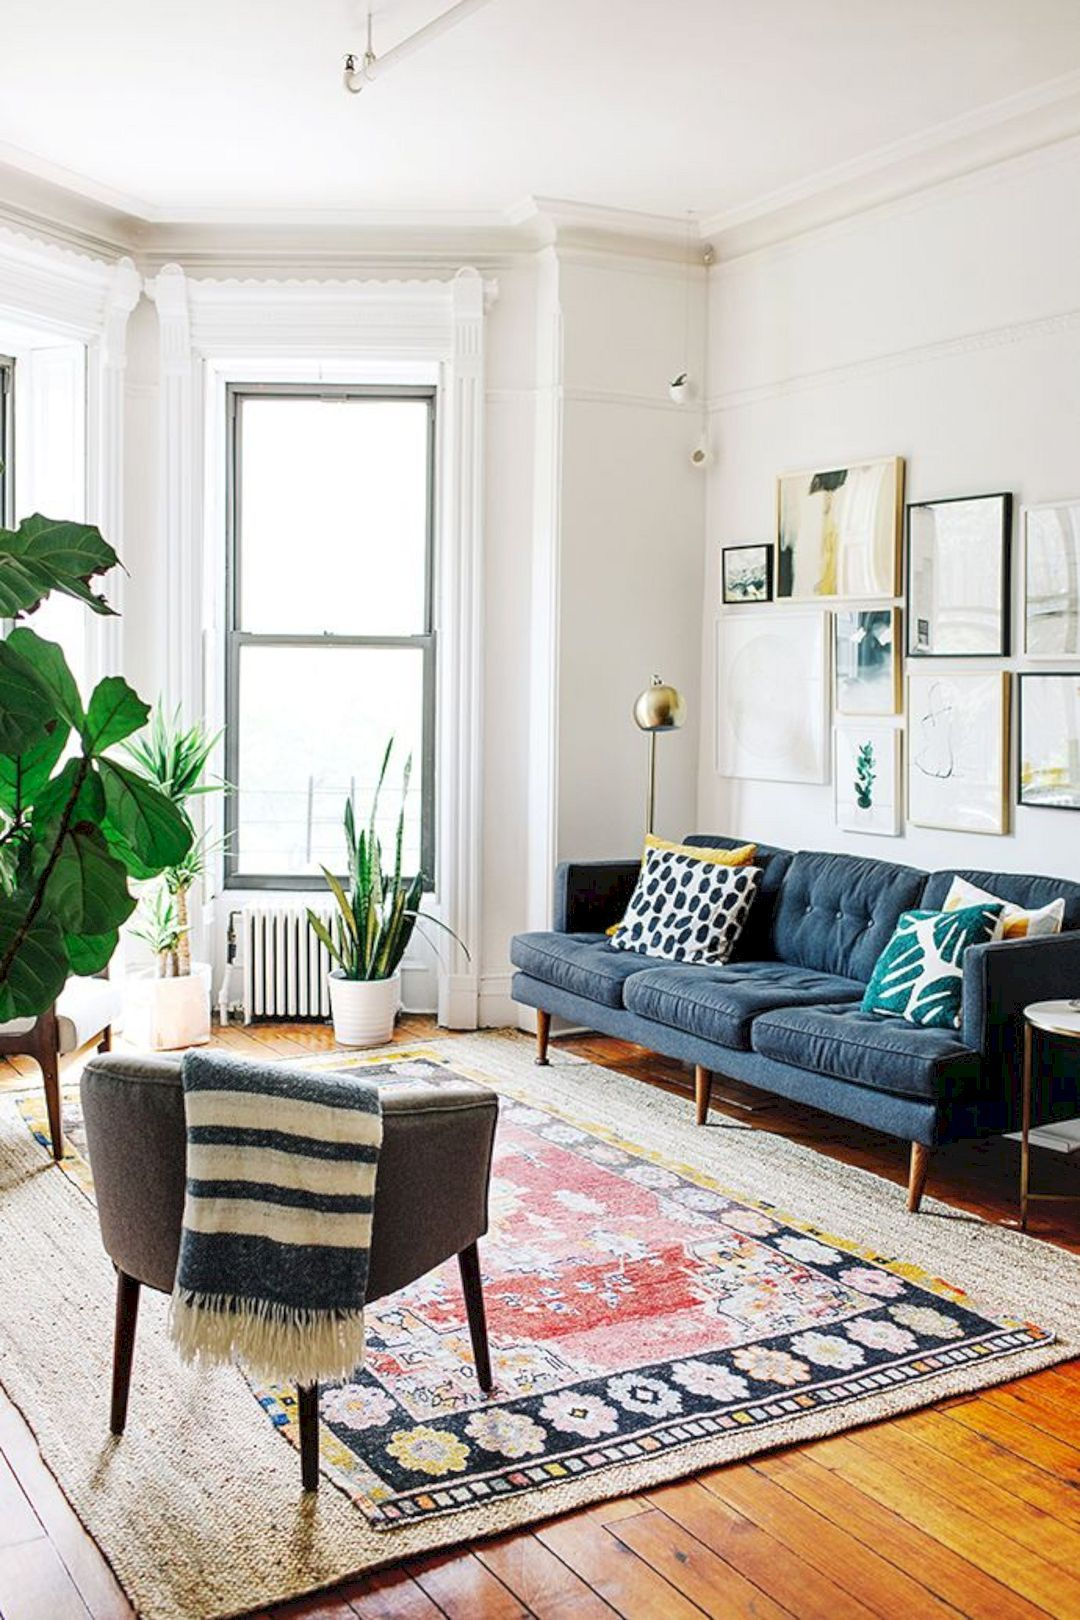 20 stunning small living room decorating ideas living room room 20 stunning small living room decorating ideas